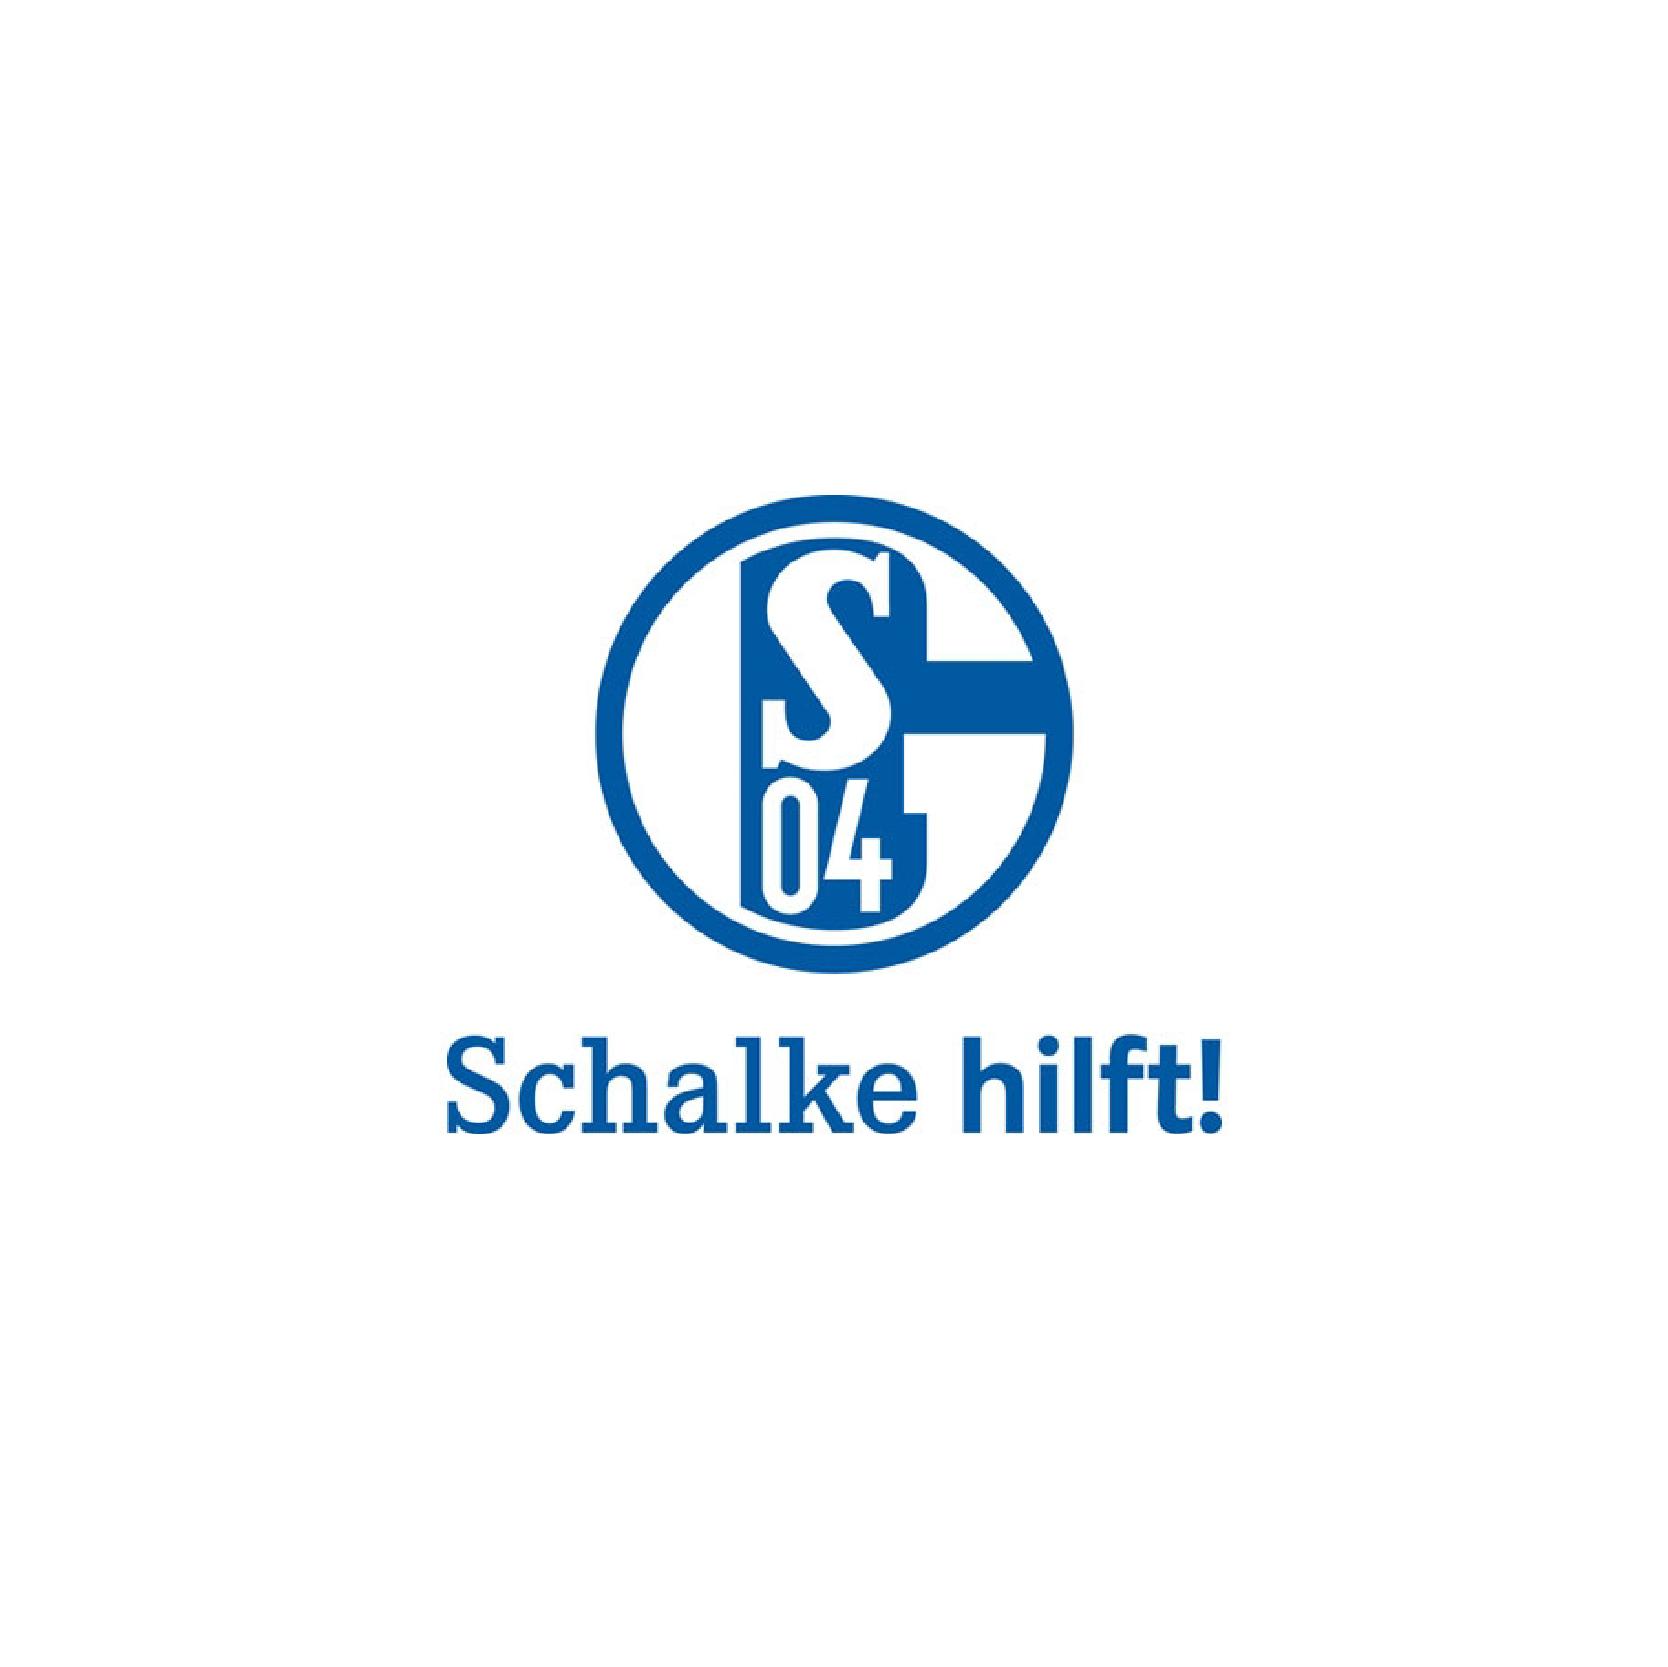 Schalke 04 Schalke hilft Logo